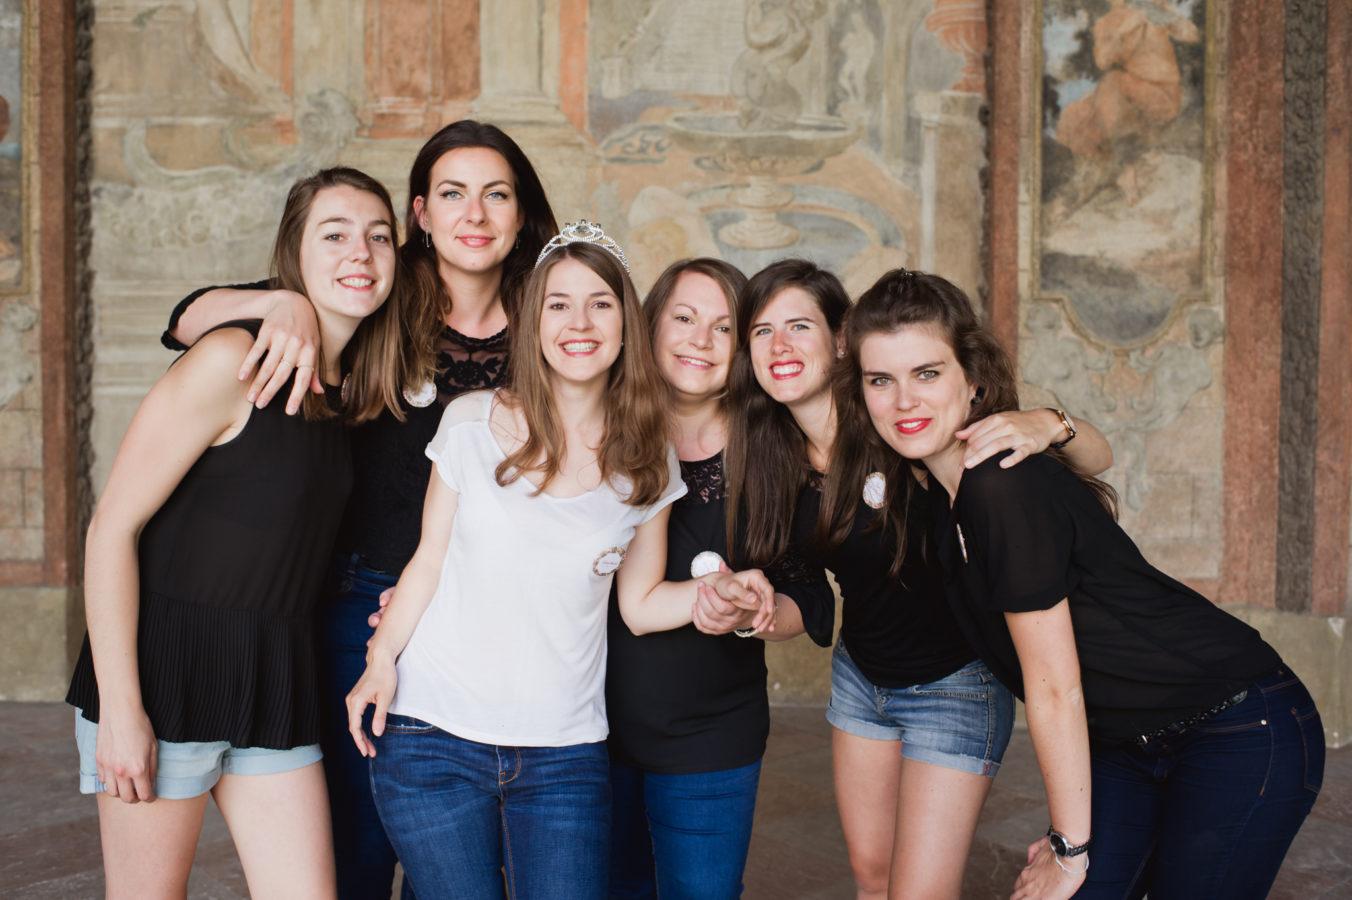 The girls of prague